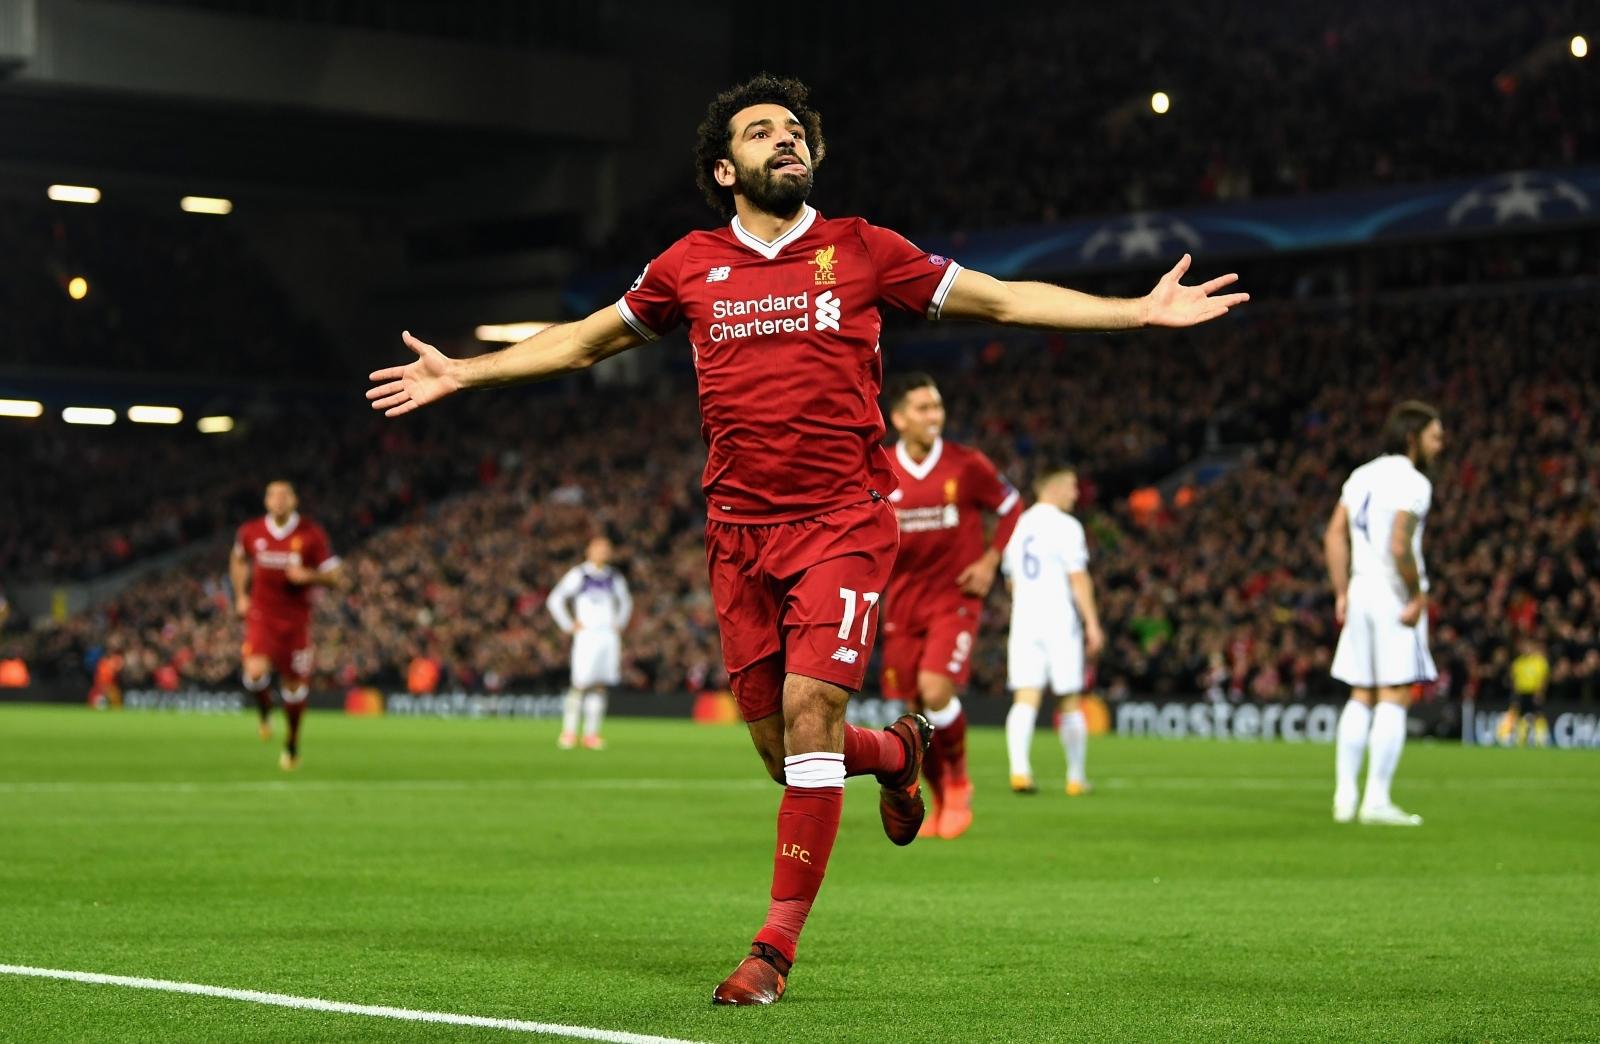 Liverpool Manager Jurgen Klopp Tells Of Club Officials